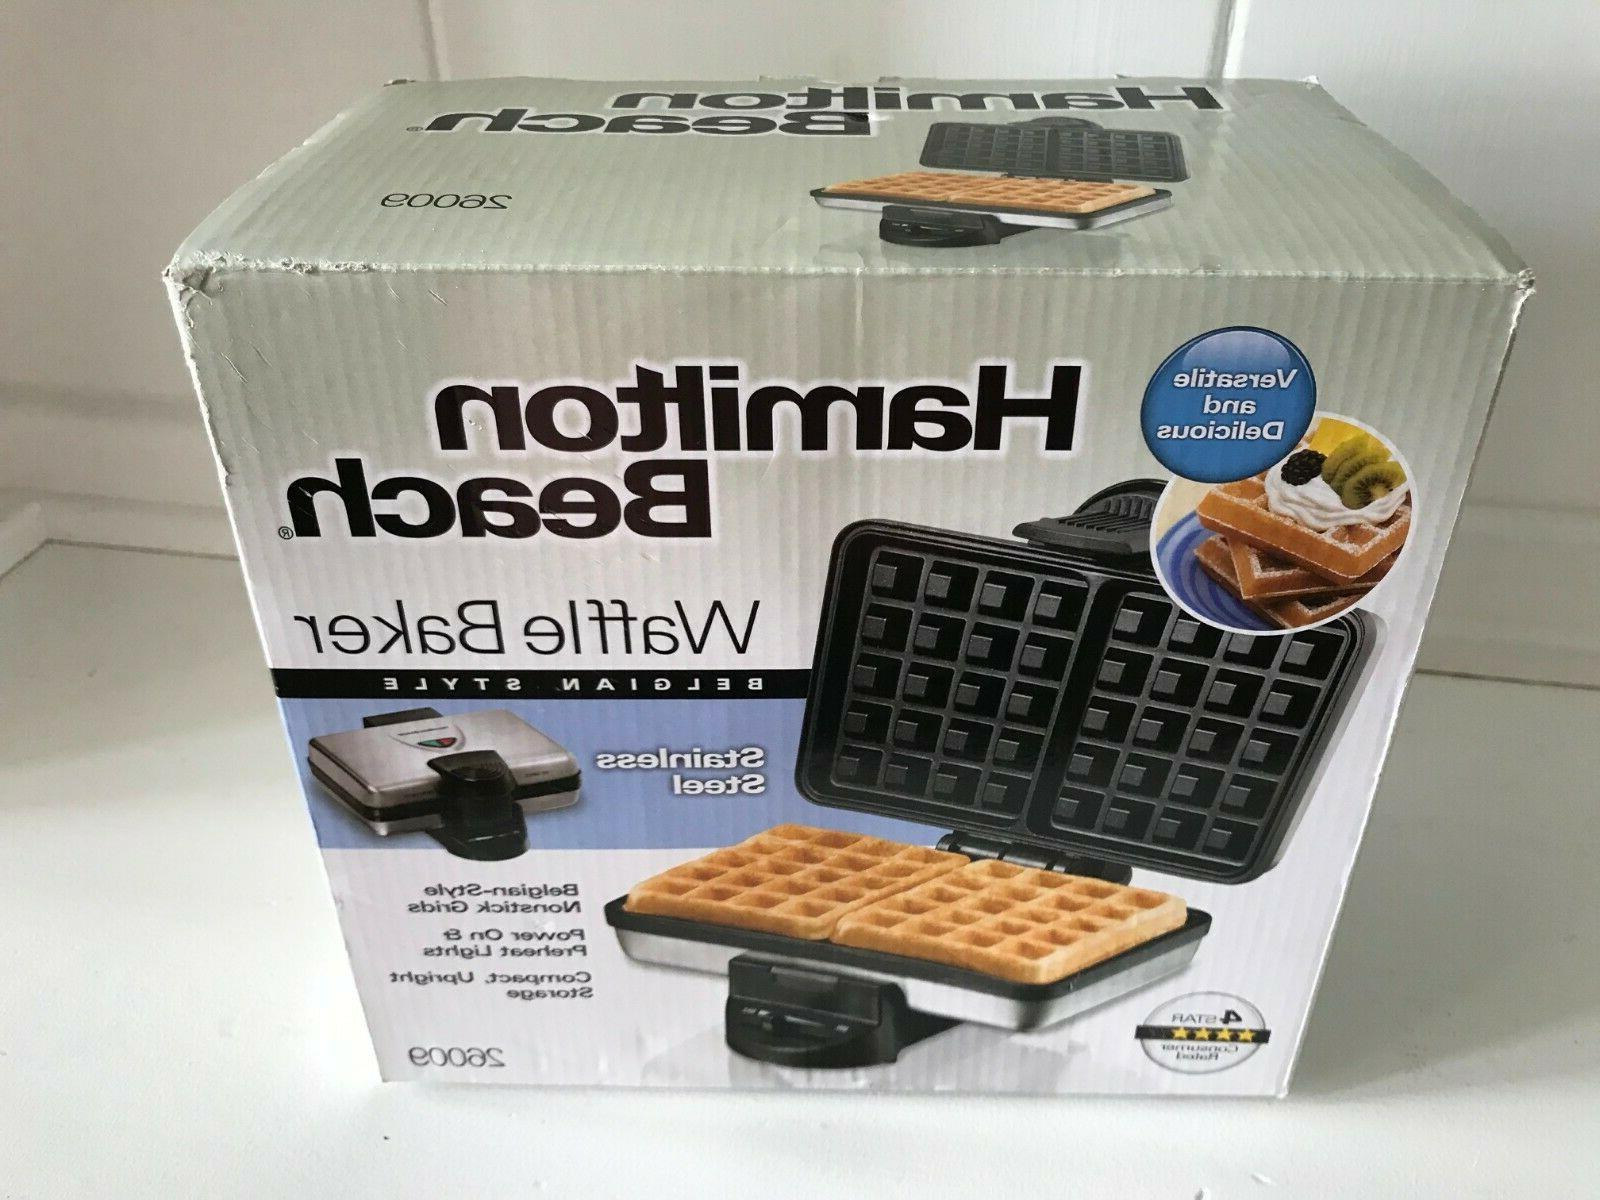 26009 nonstick belgian waffle maker easy to